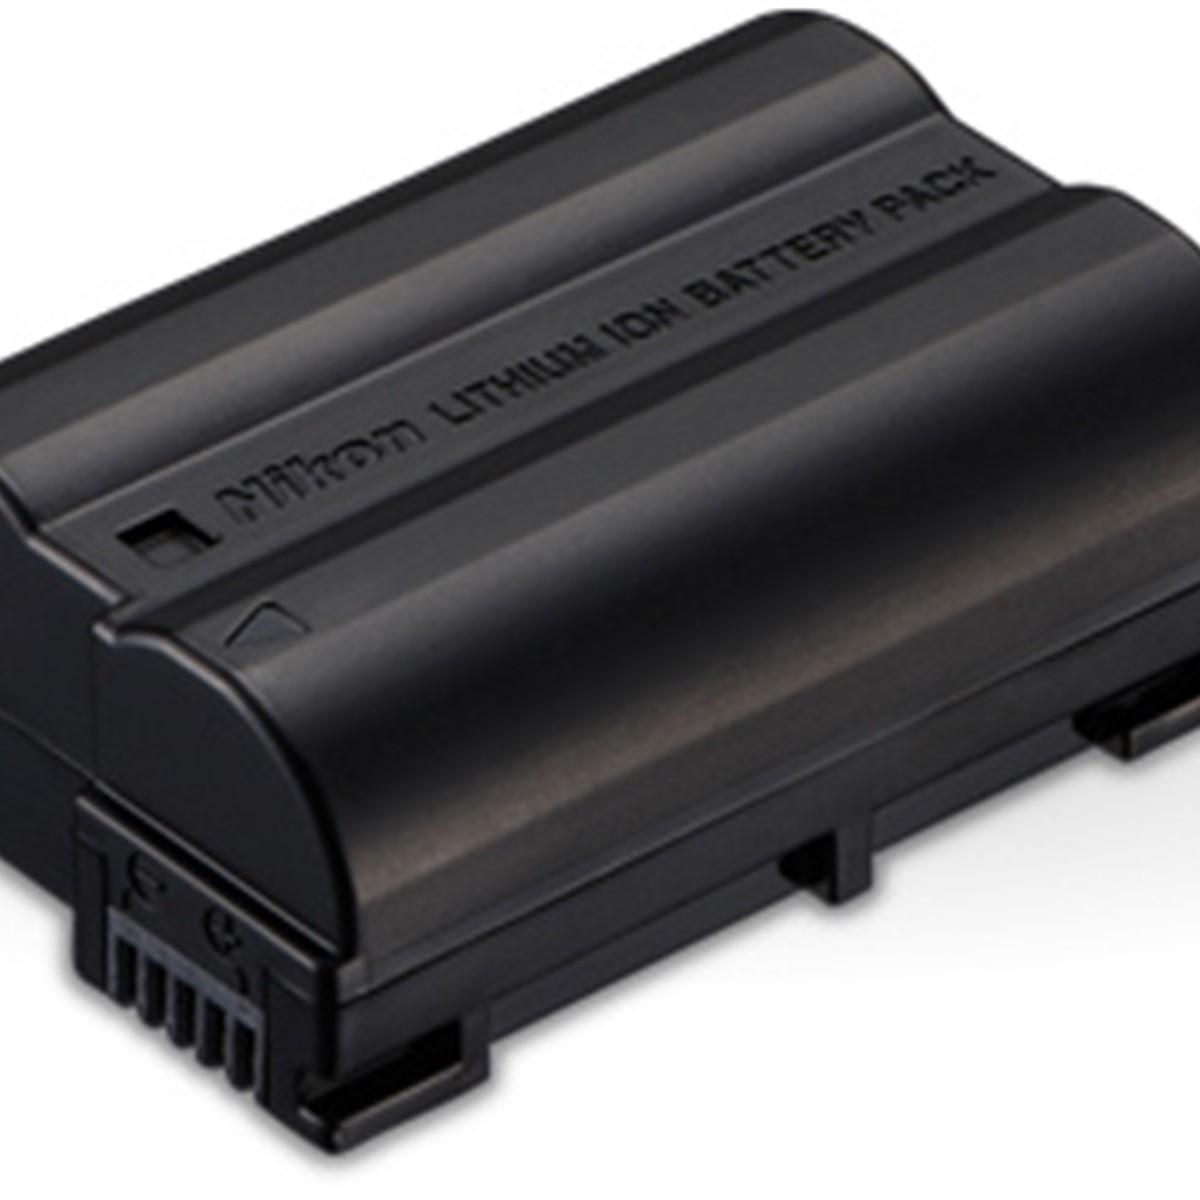 Nikon updates battery recall: Overheating batteries from 2012 still